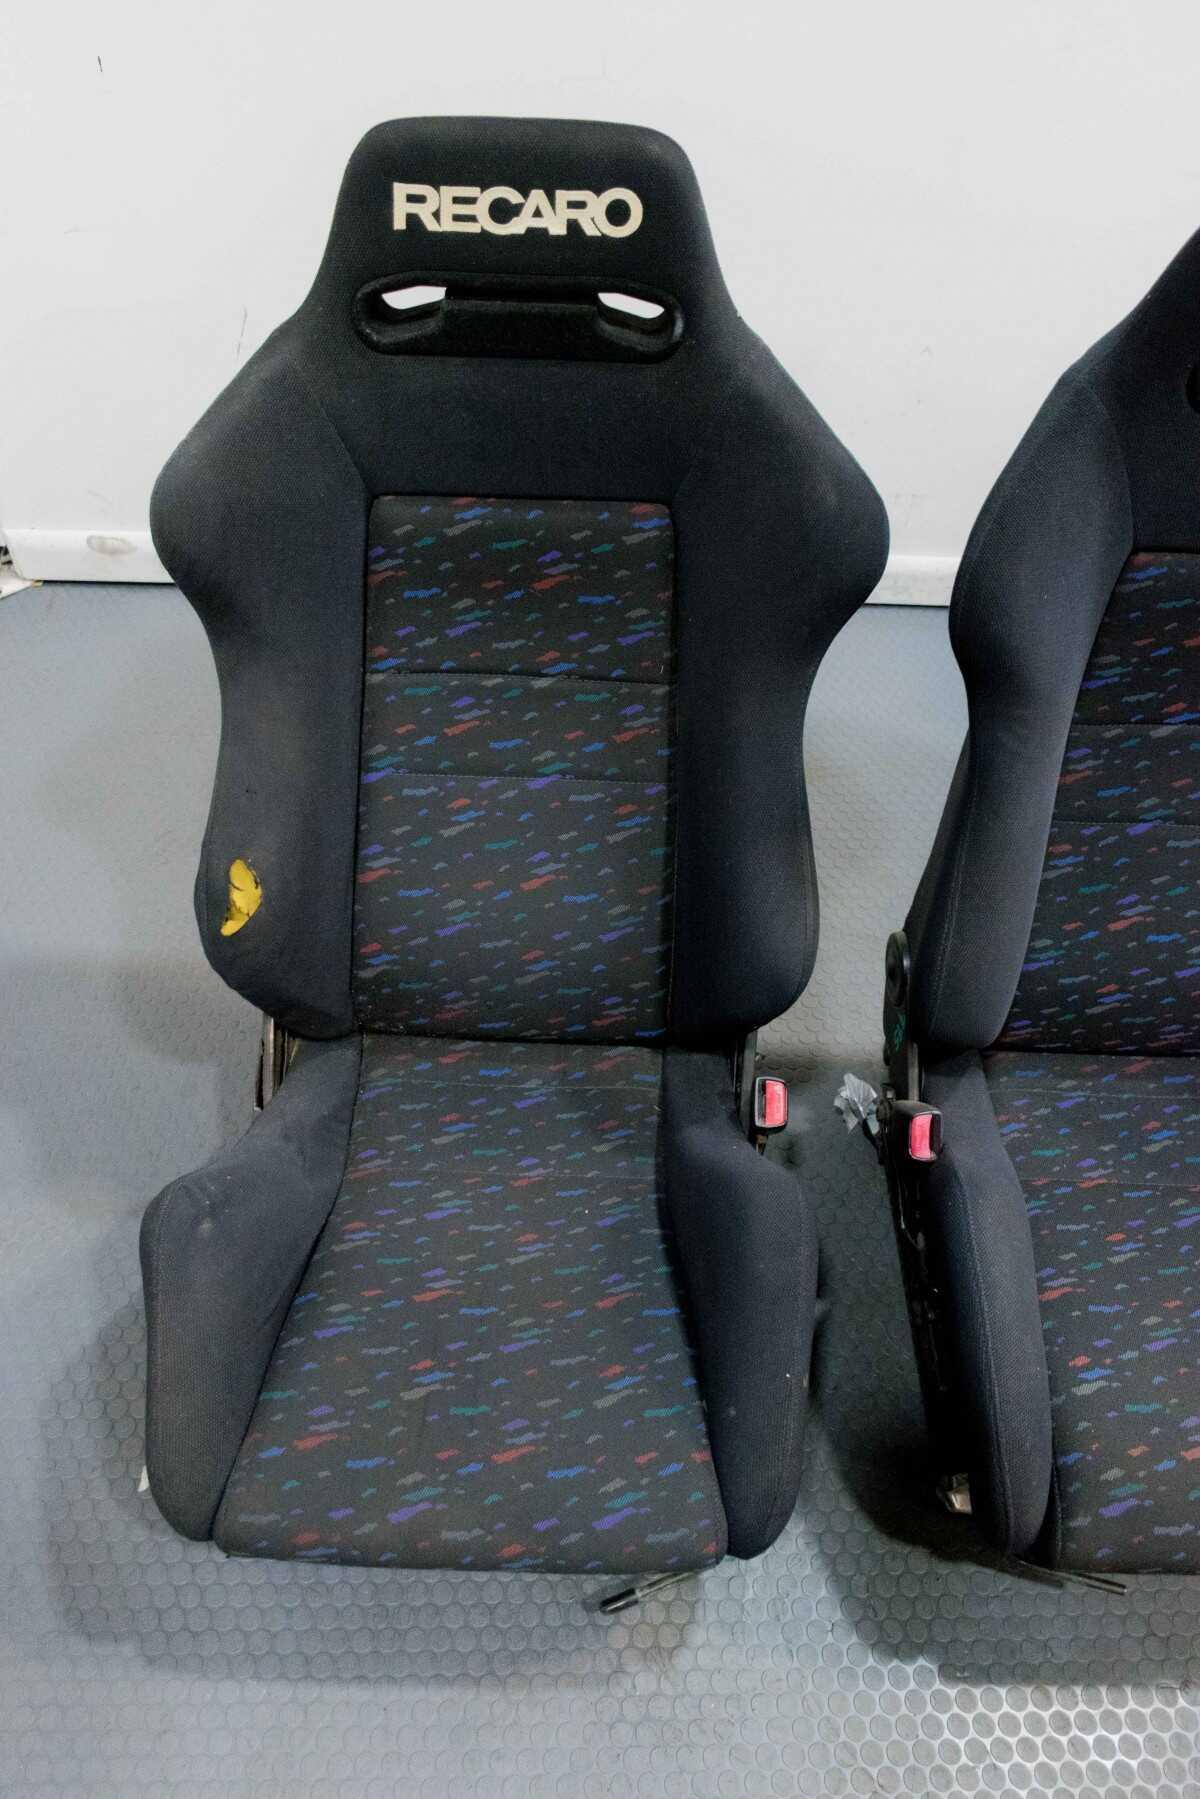 Toyota Of Sanford >> Used Set of Recaro Confetti SR3 Seats for JDM MK4 Supra 1993-2001 | Seats | J-Spec Auto Sports